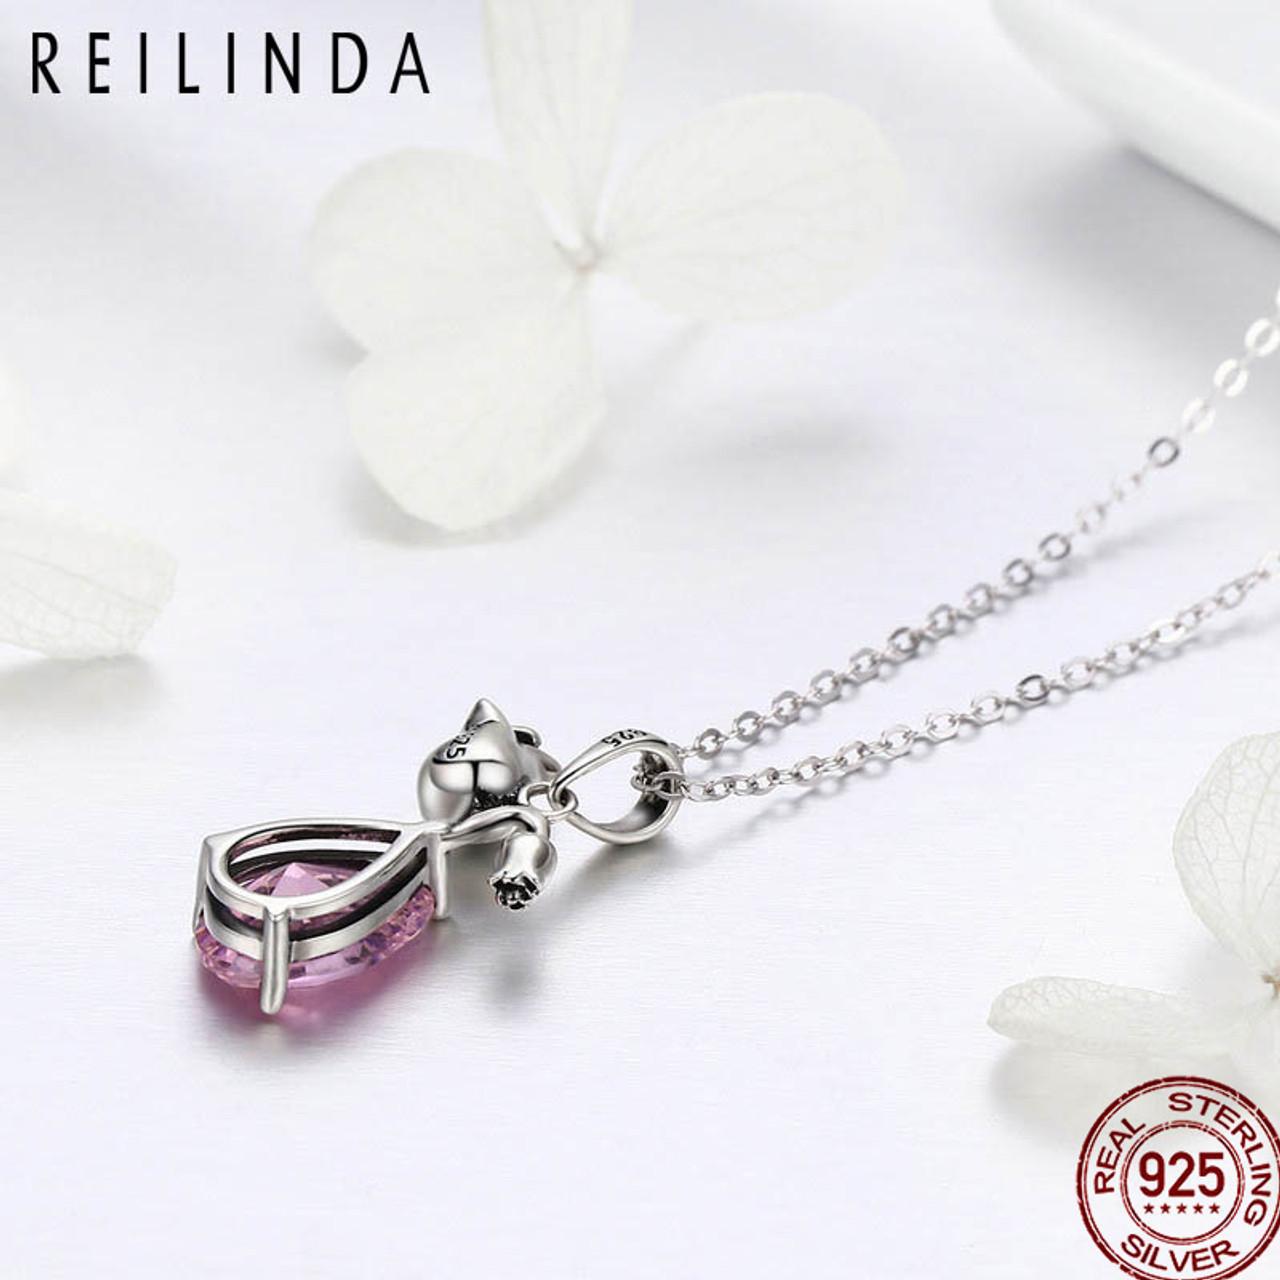 DHJAXL 100/% 925 Sterling Silver Romantic Rose Flower Pink Water Drop CZ Long Chain Women Pendant Necklace Silver Jewelry